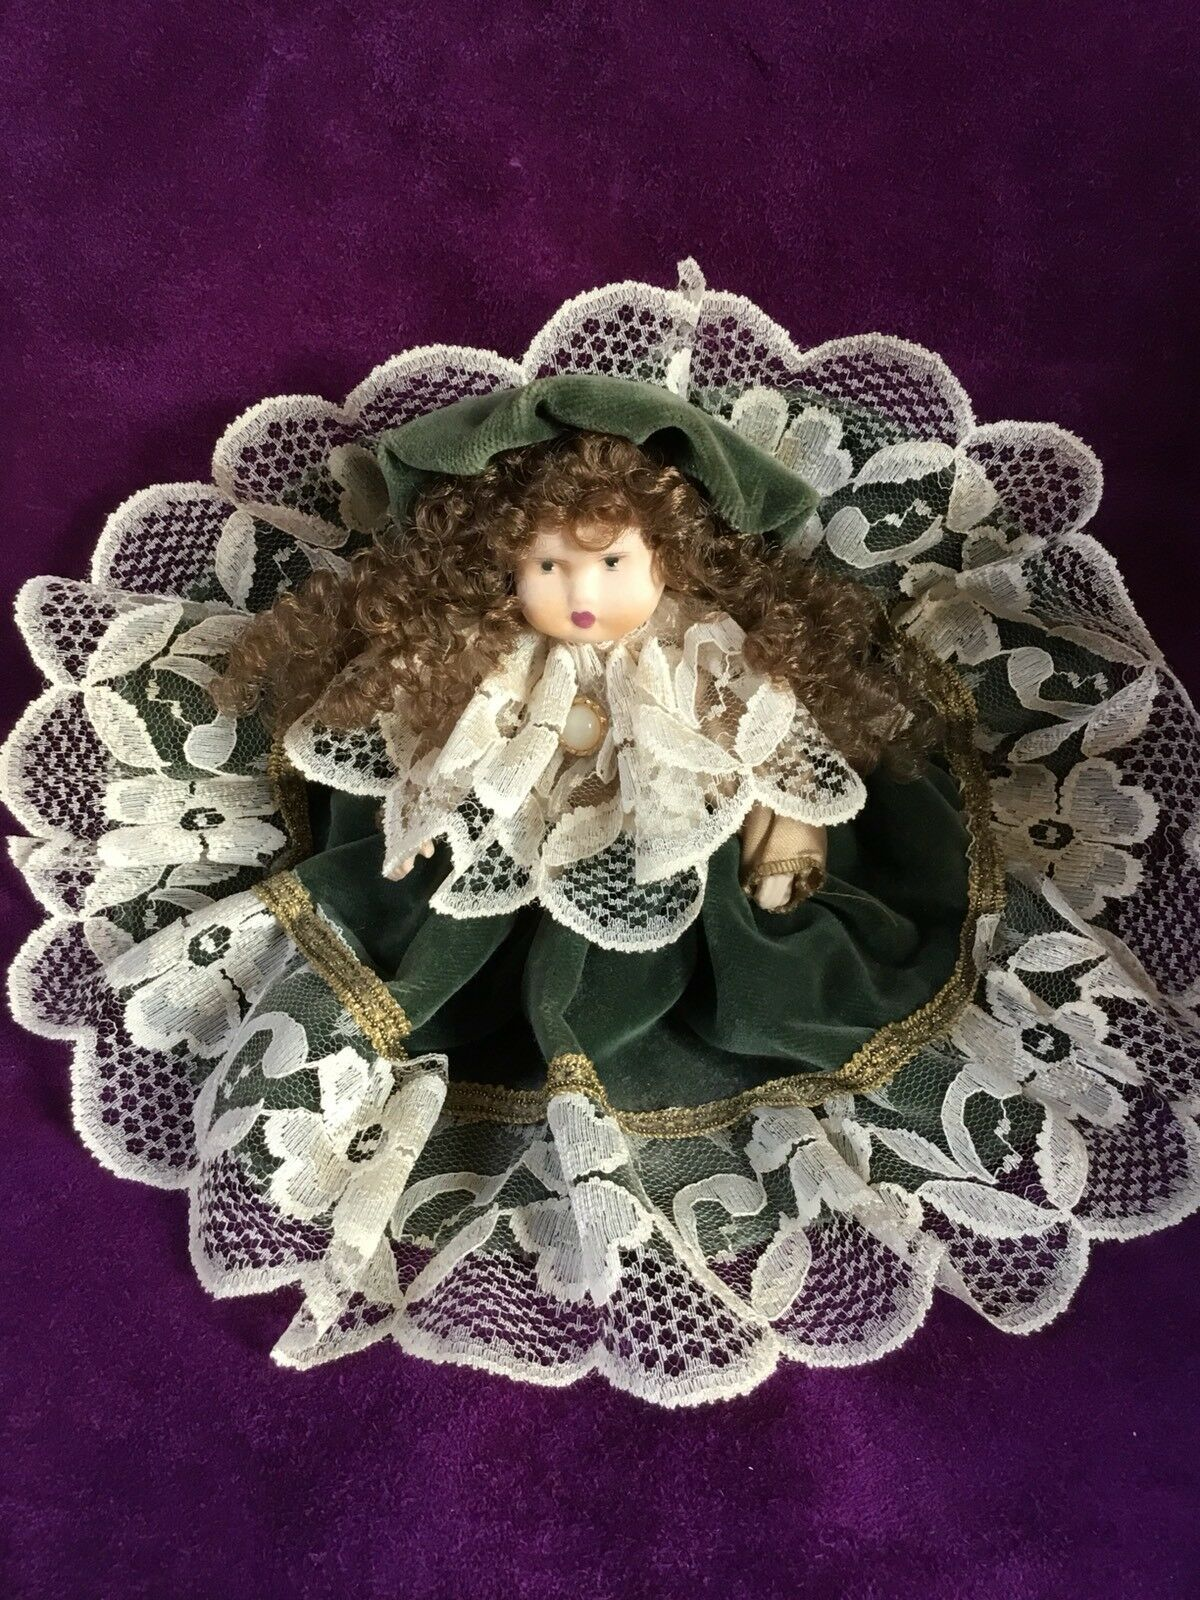 Bambola Porcellana Old Biscuit bambola Faenza Claudia Focaccia 20  Cm.  garantito